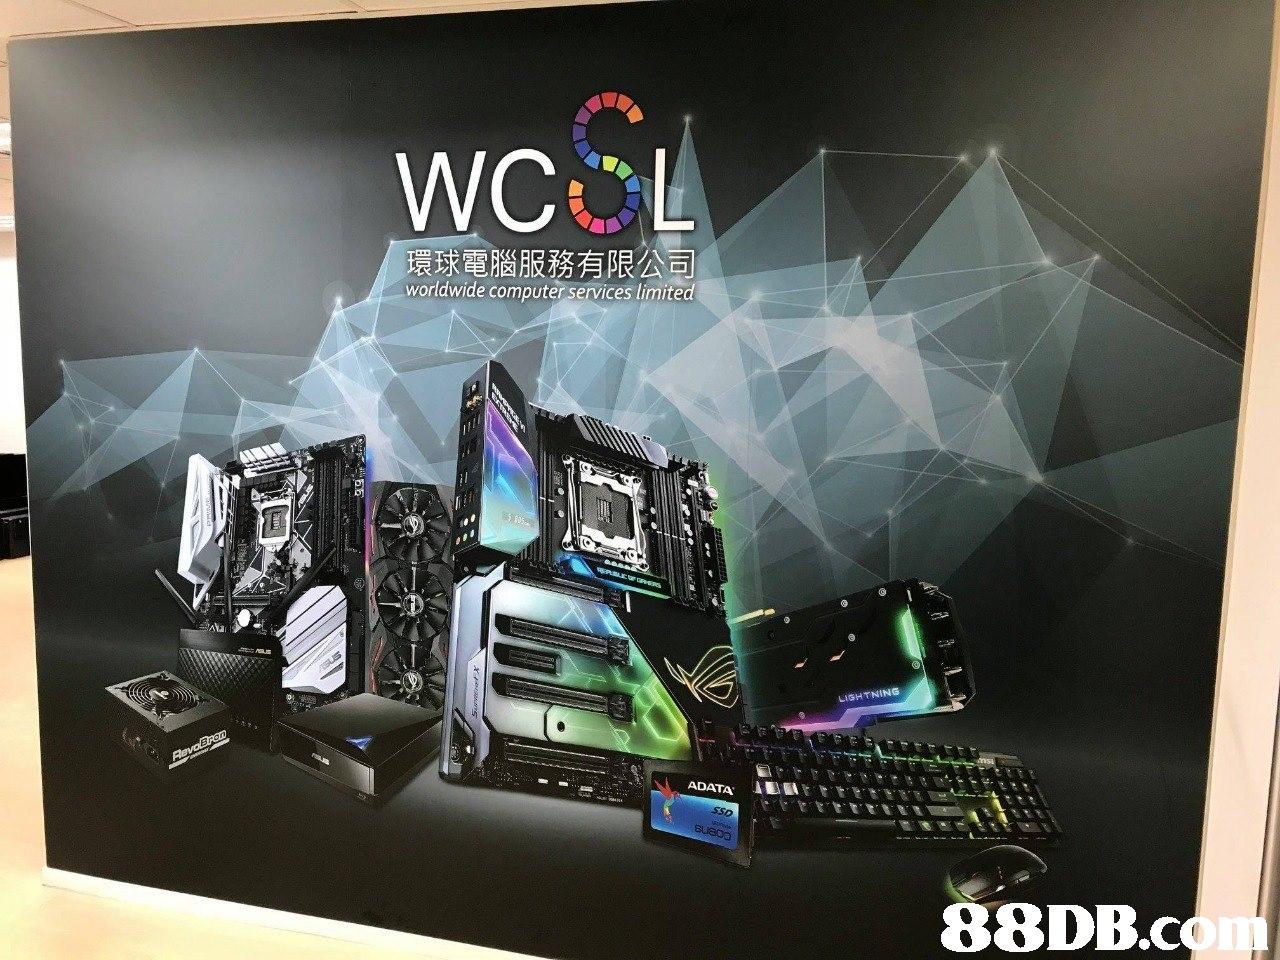 WC 環球電腦服務有限公司 worldwide computer services limited LIGHTNING 88DB.c  technology,multimedia,